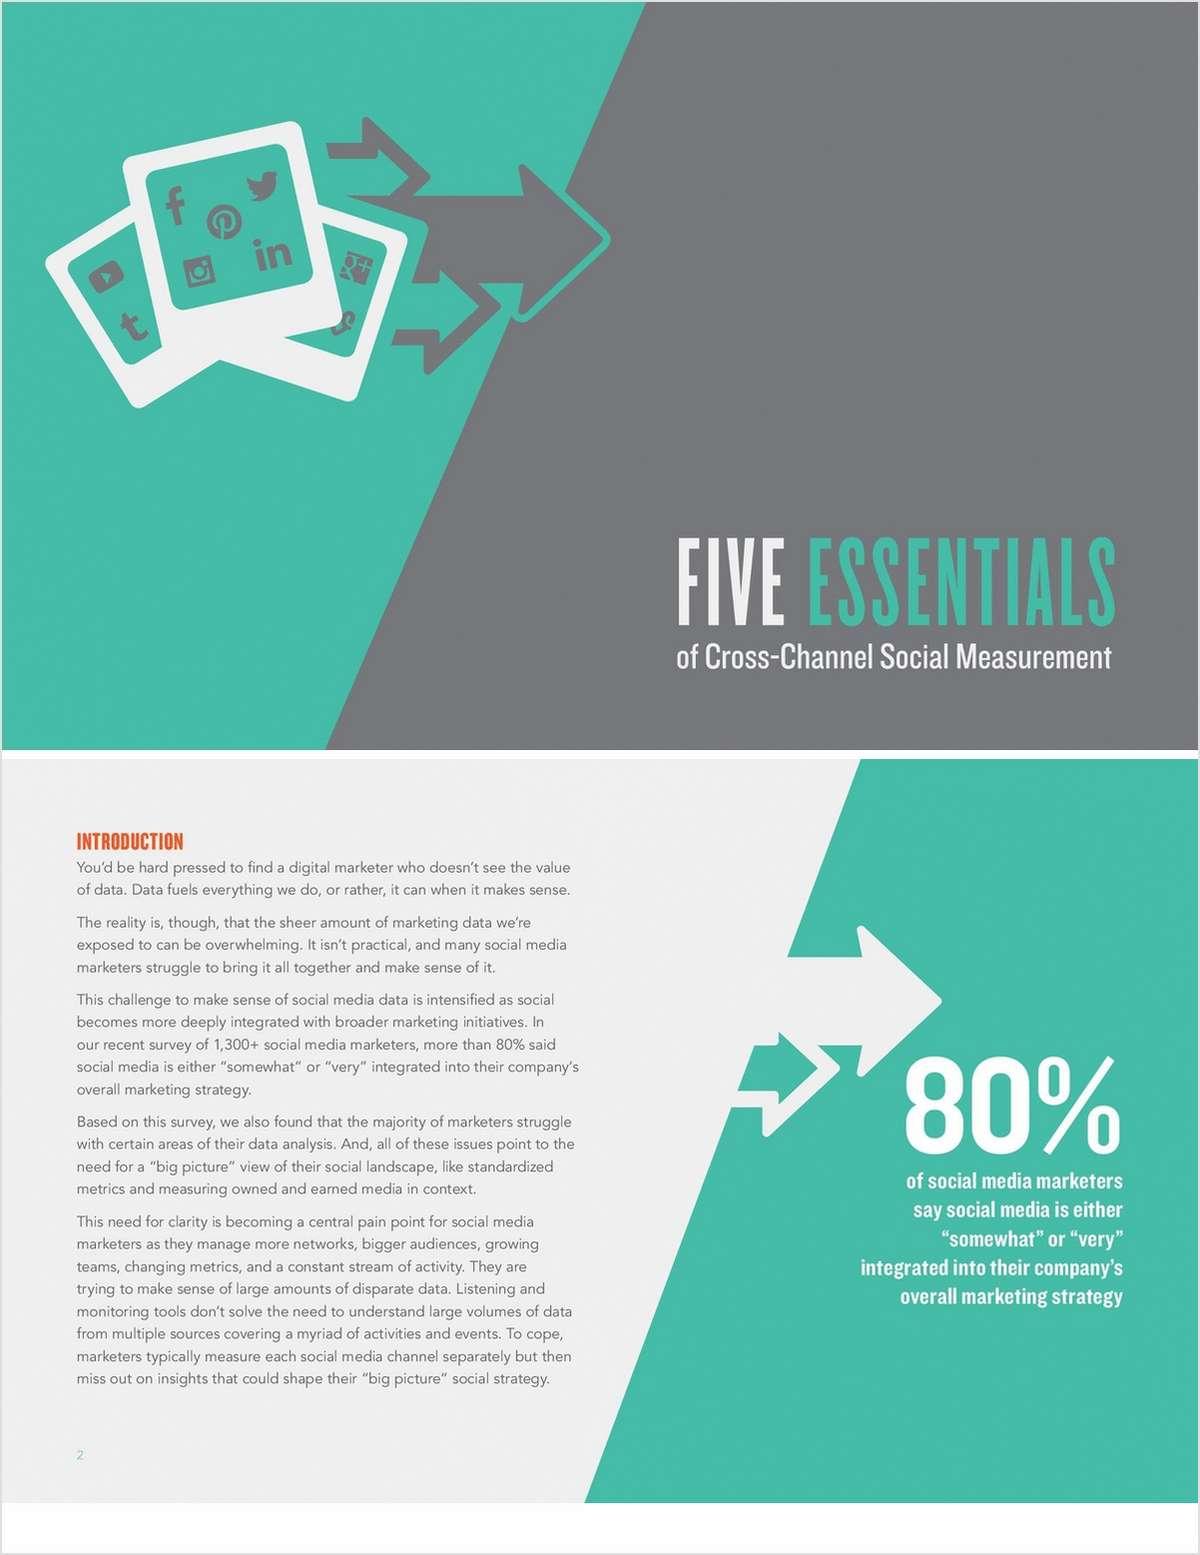 Five Essentials of Cross-Channel Social Measurement